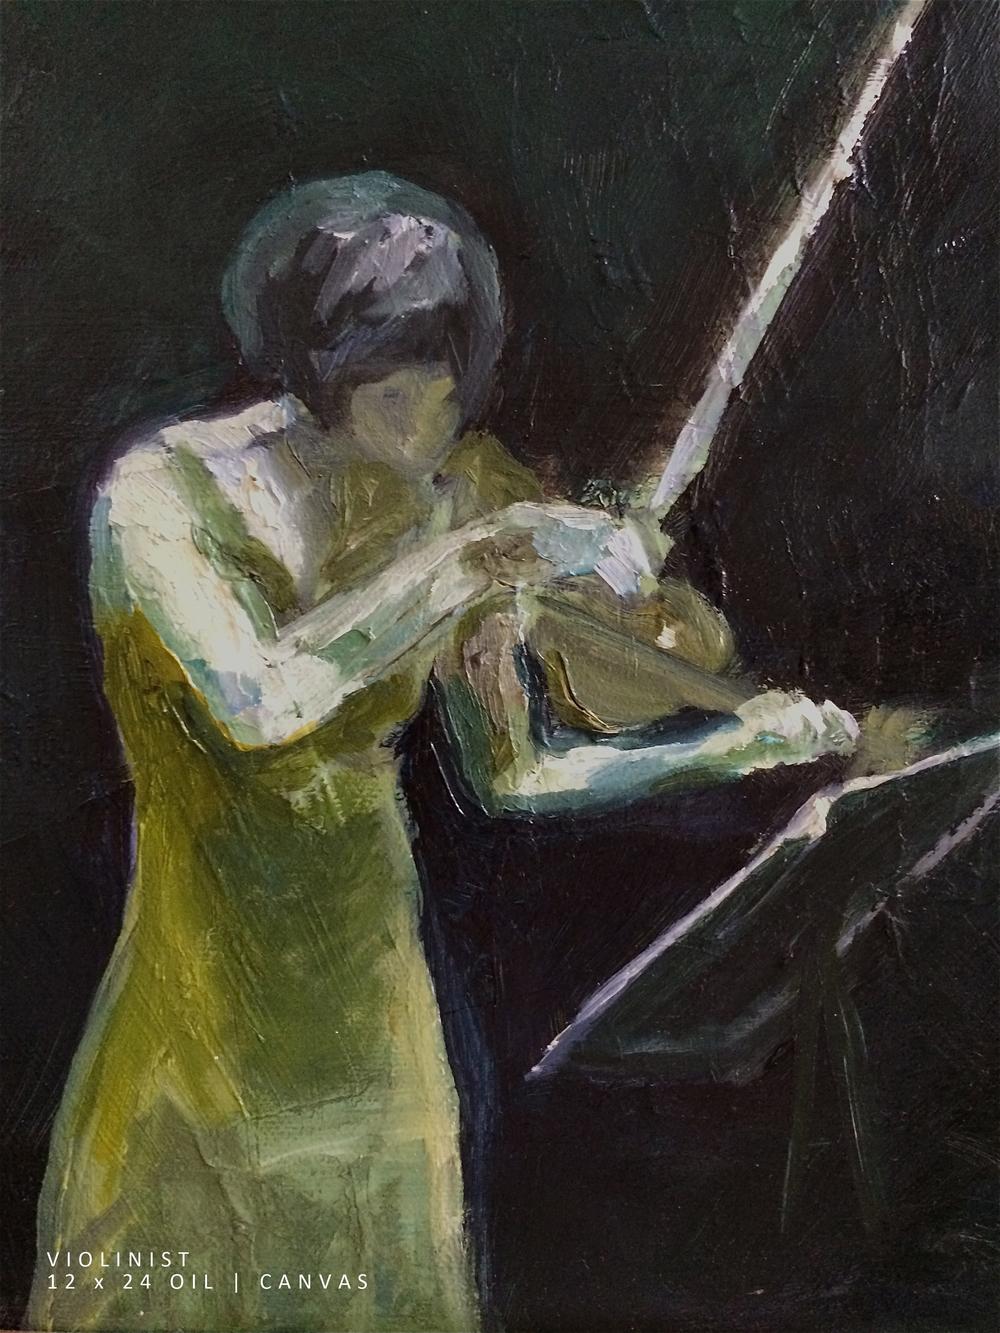 Violinist 12x12 Oil-Canvas NEW.jpg